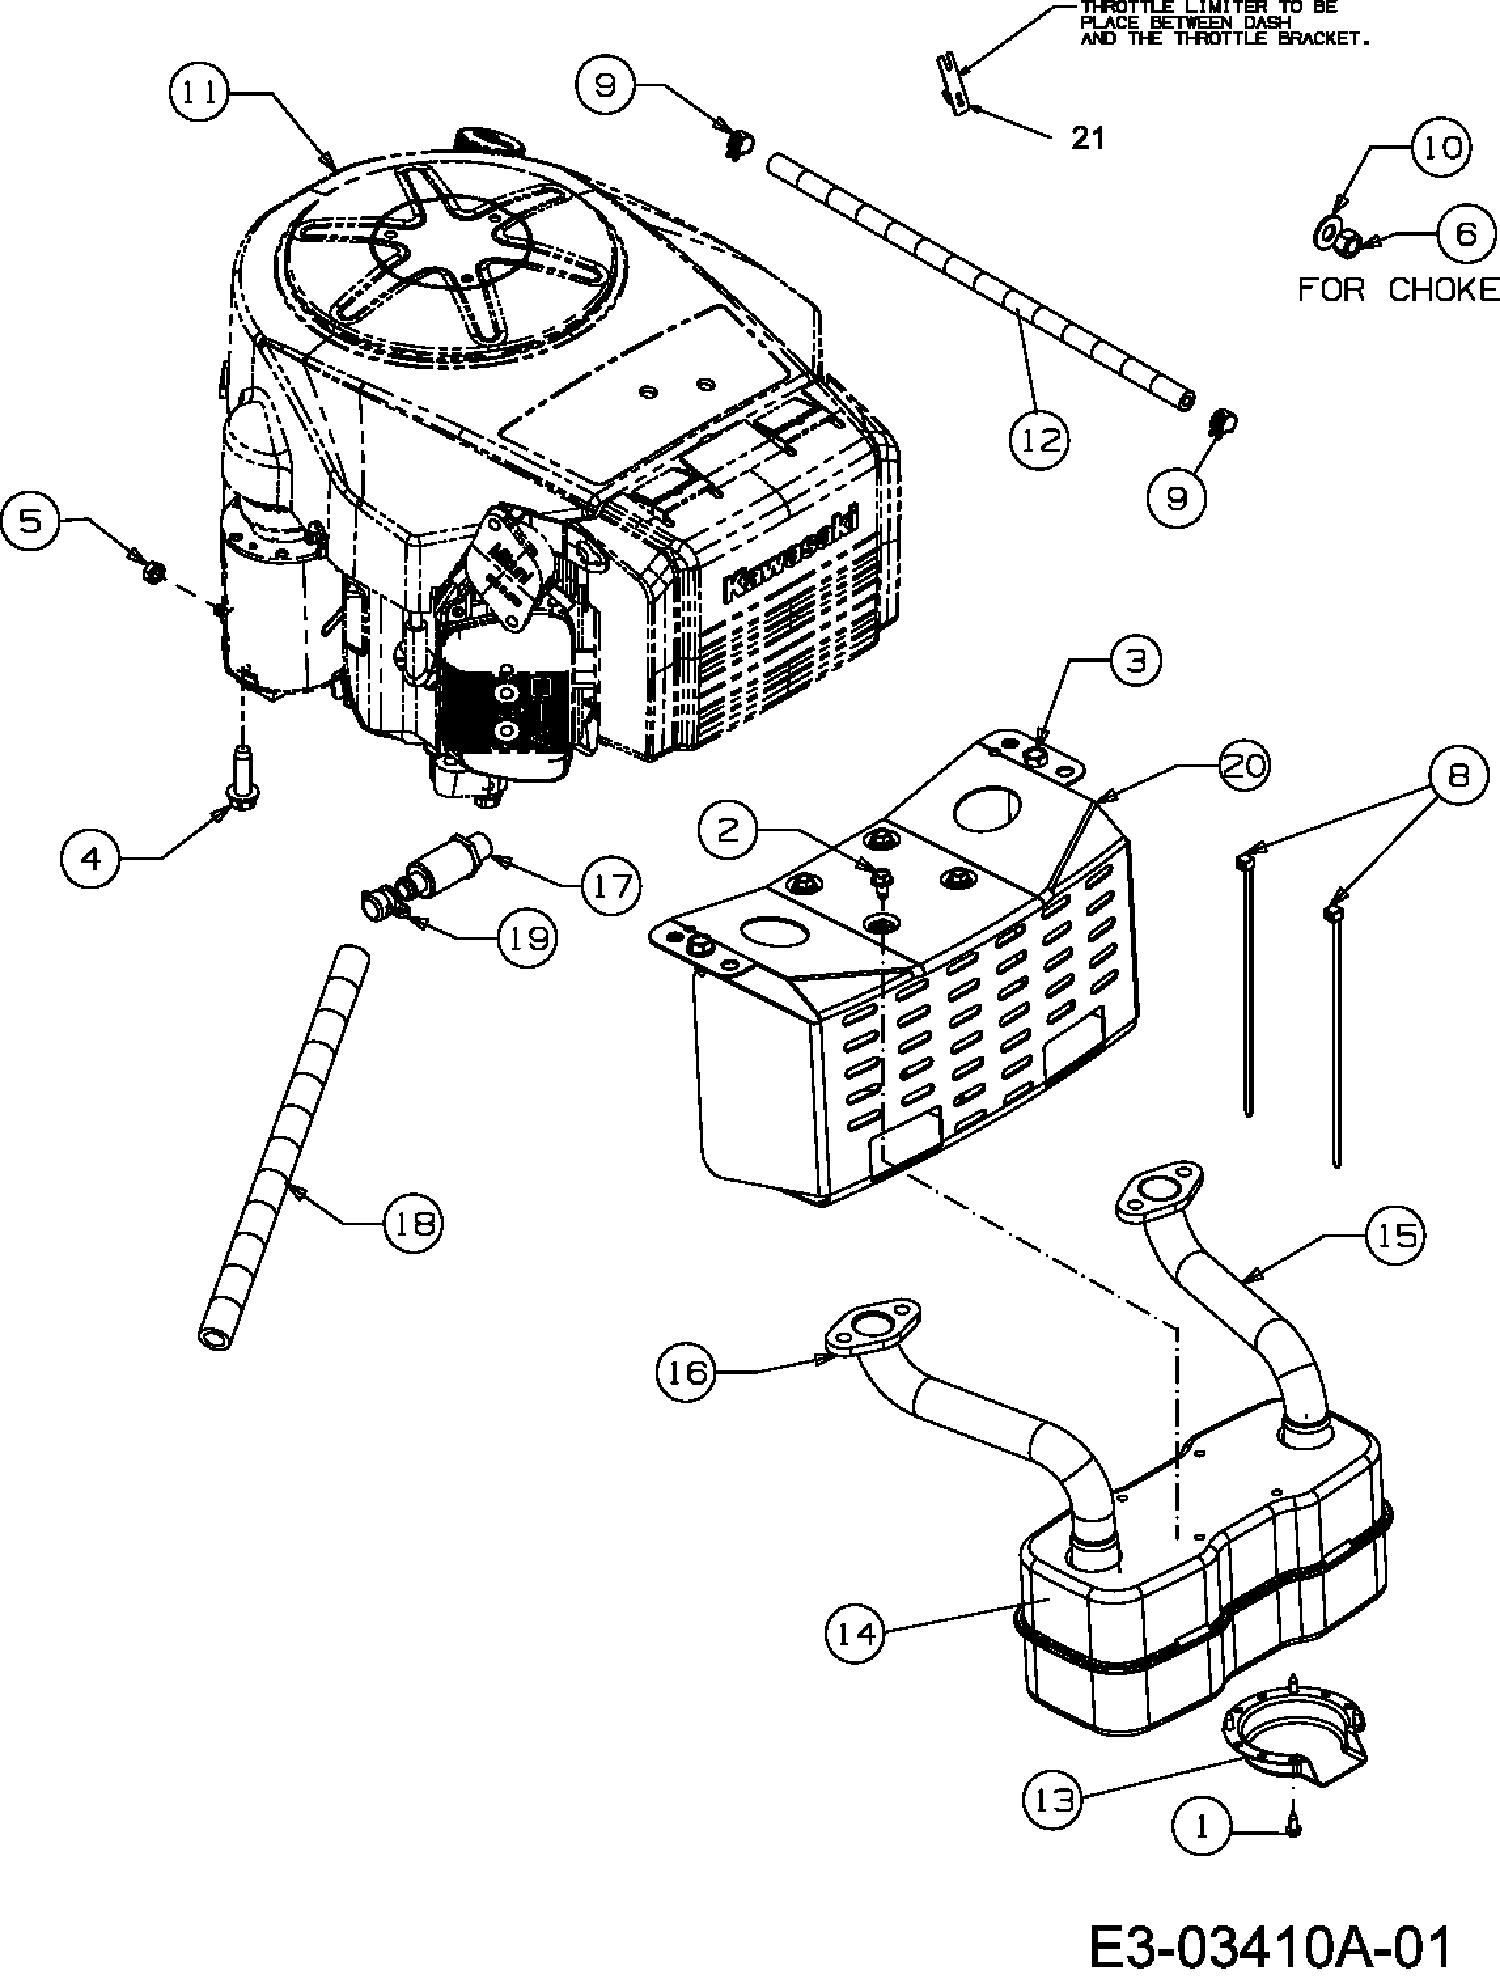 Yard-Man AN 5150 K Motorzubehör 13BI504N643 (2007)